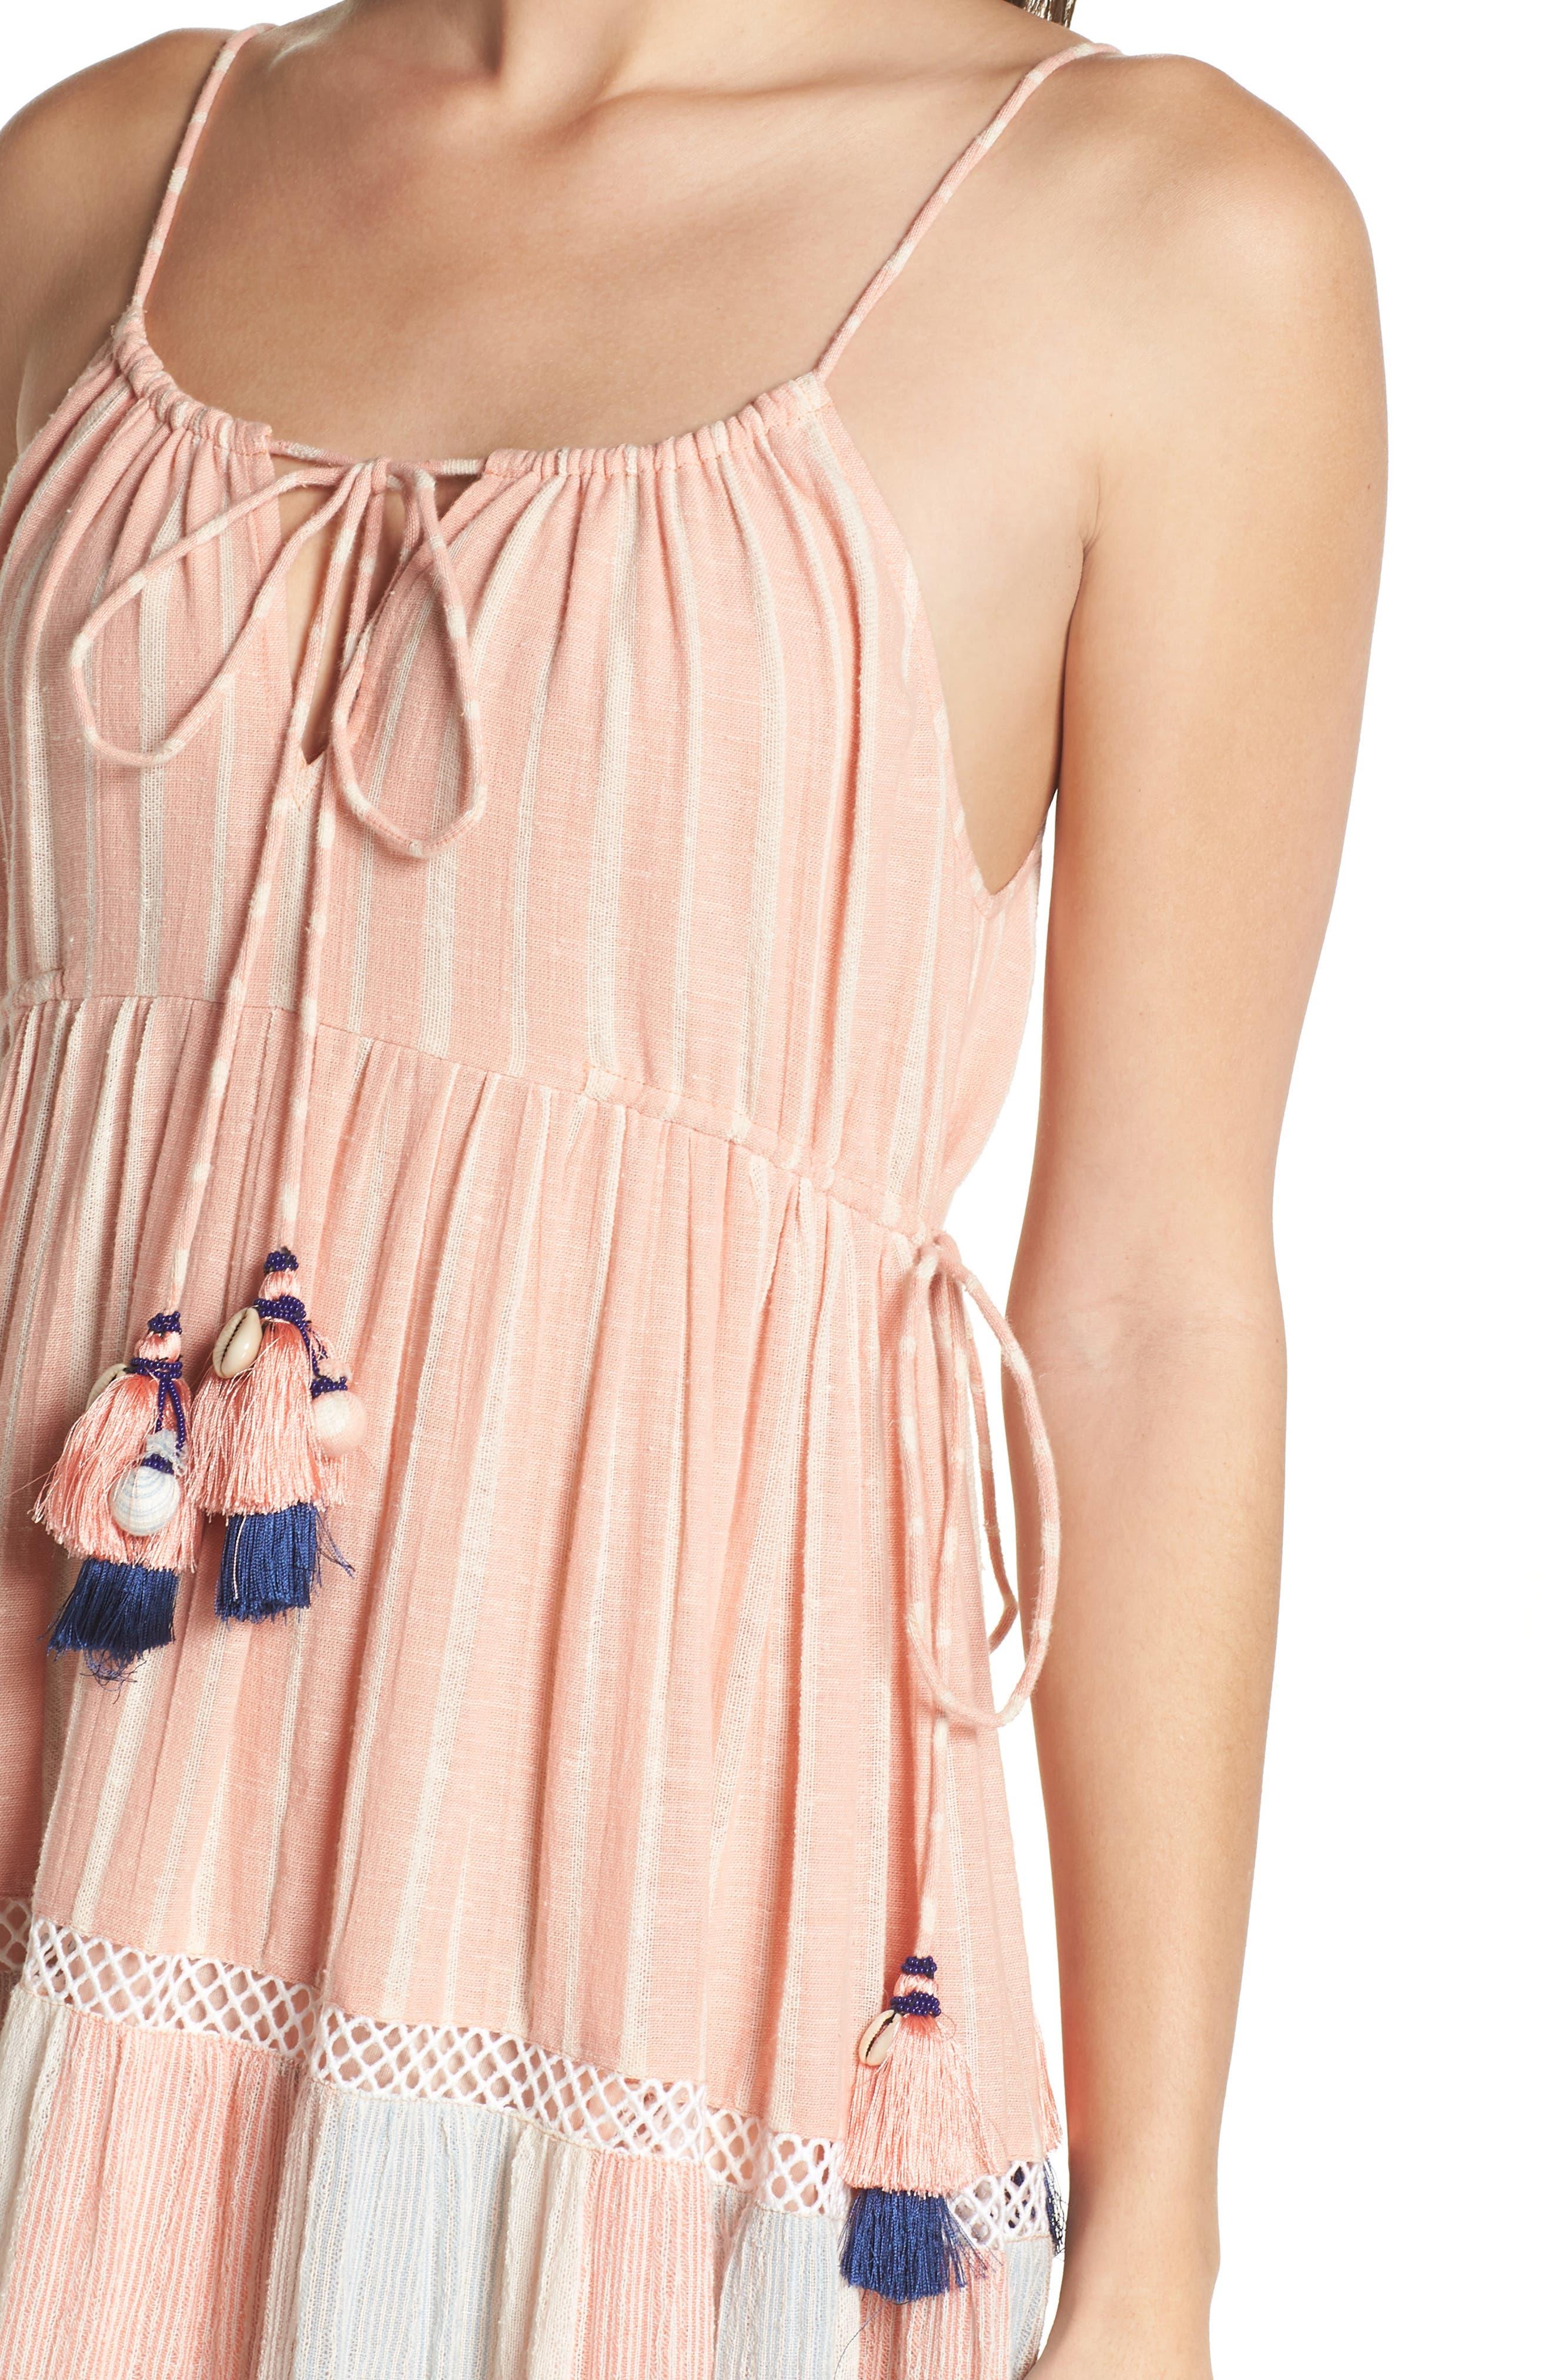 Hemant & Nandita Cover-Up Maxi Dress,                             Alternate thumbnail 4, color,                             650